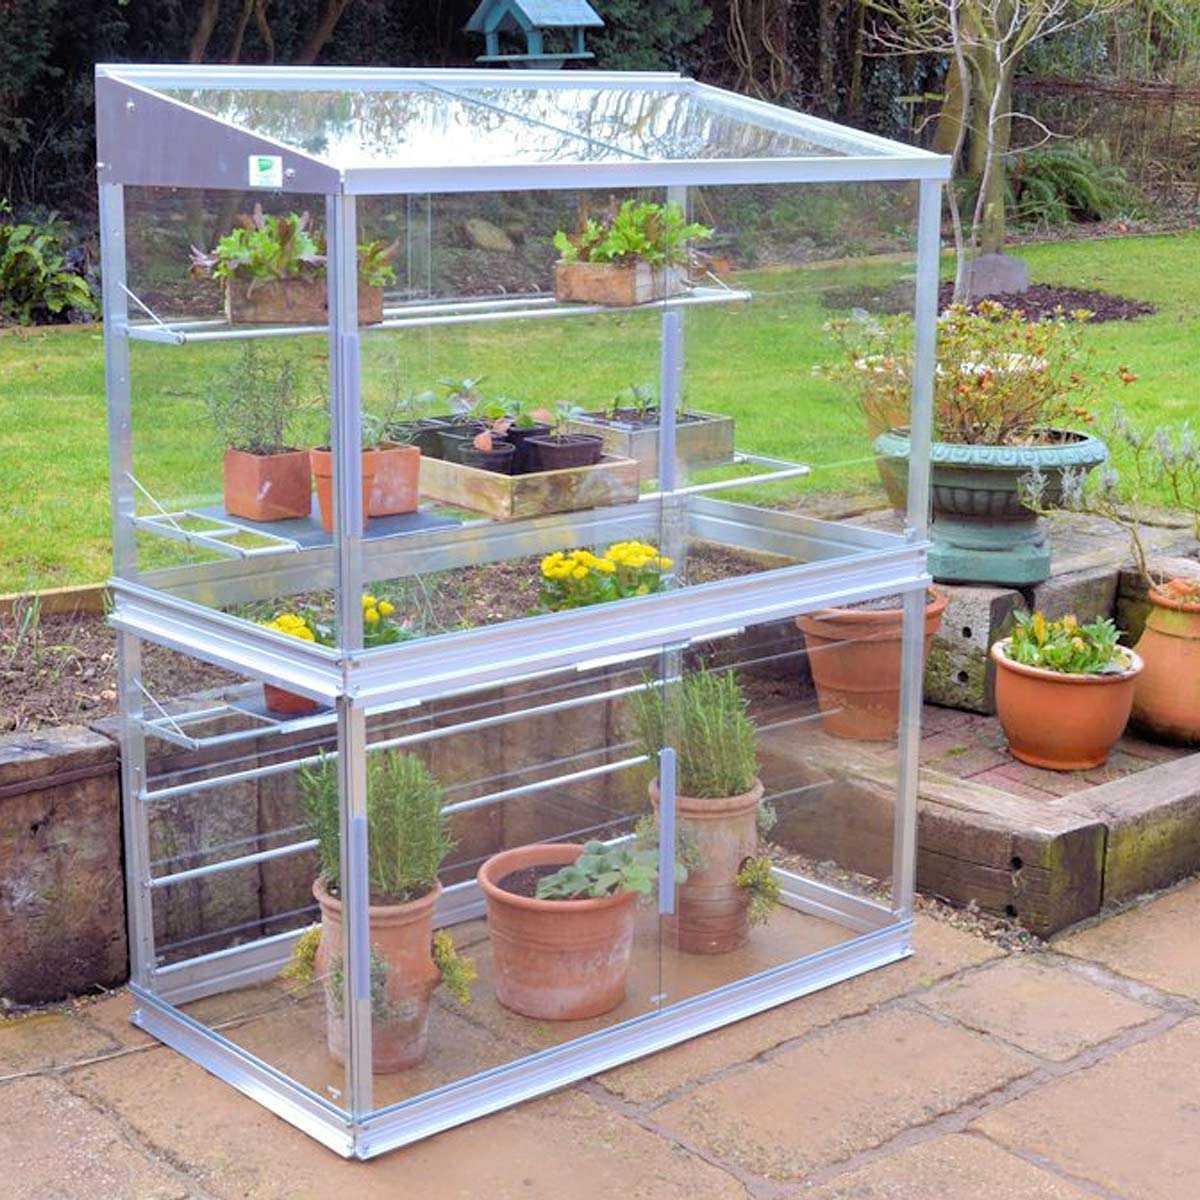 Mini Serre De Jardin En Verre Et Aluminium H.150Cm serapportantà Petites Serres De Jardin